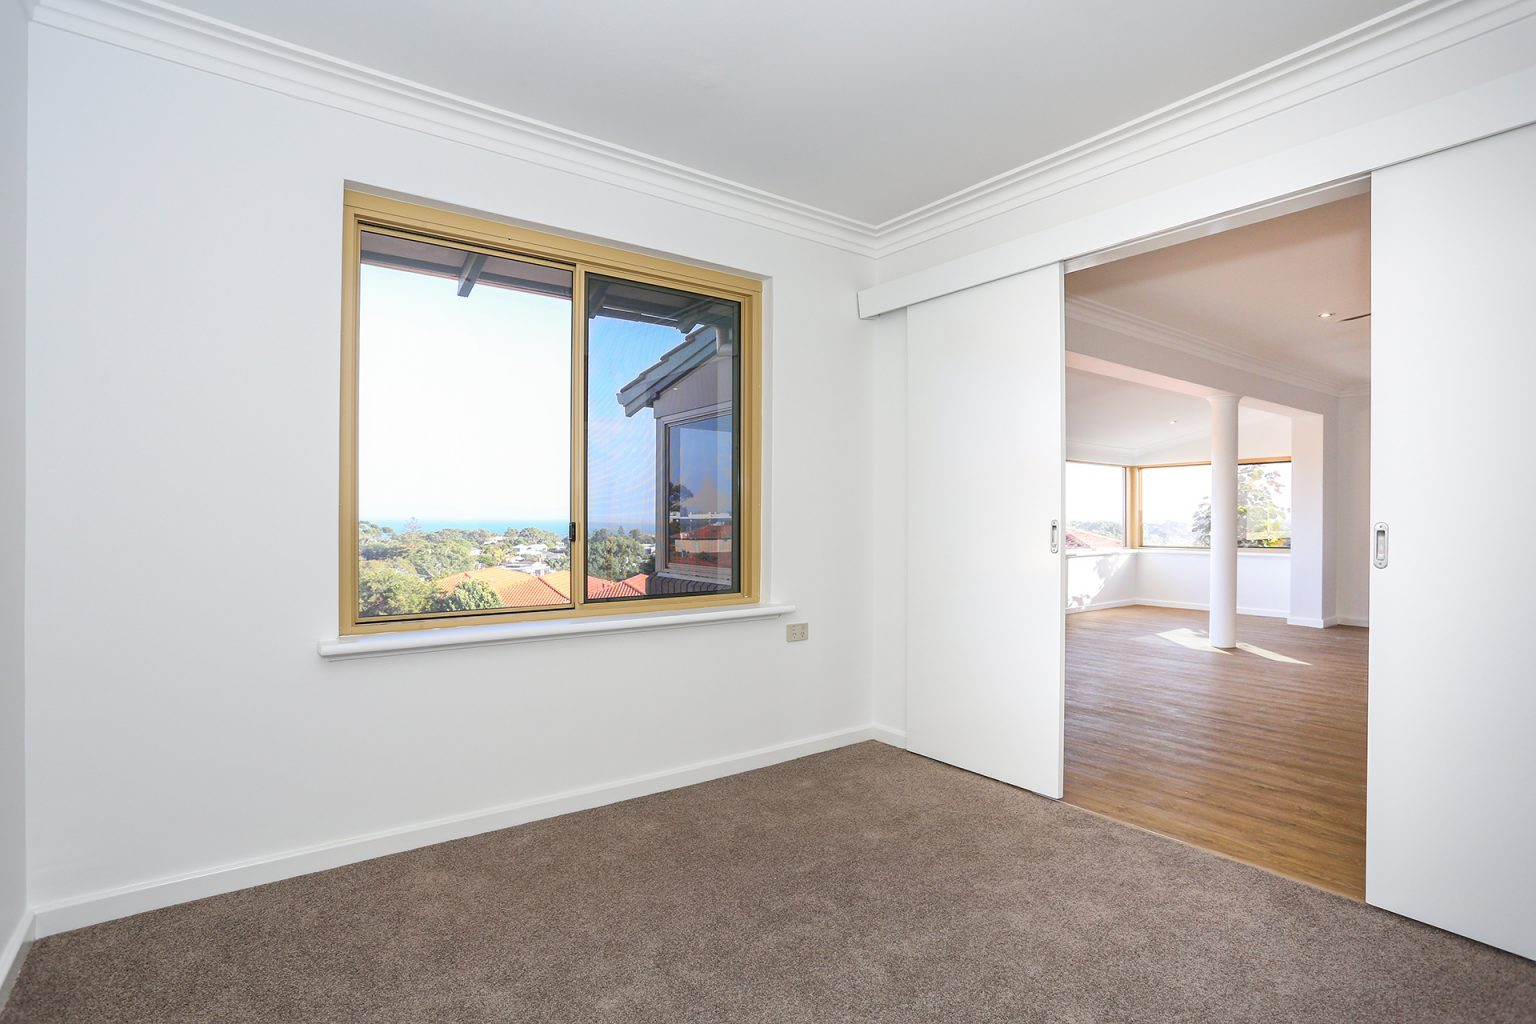 bedroom of villa for sale. window looks onto city beach and ocean views.